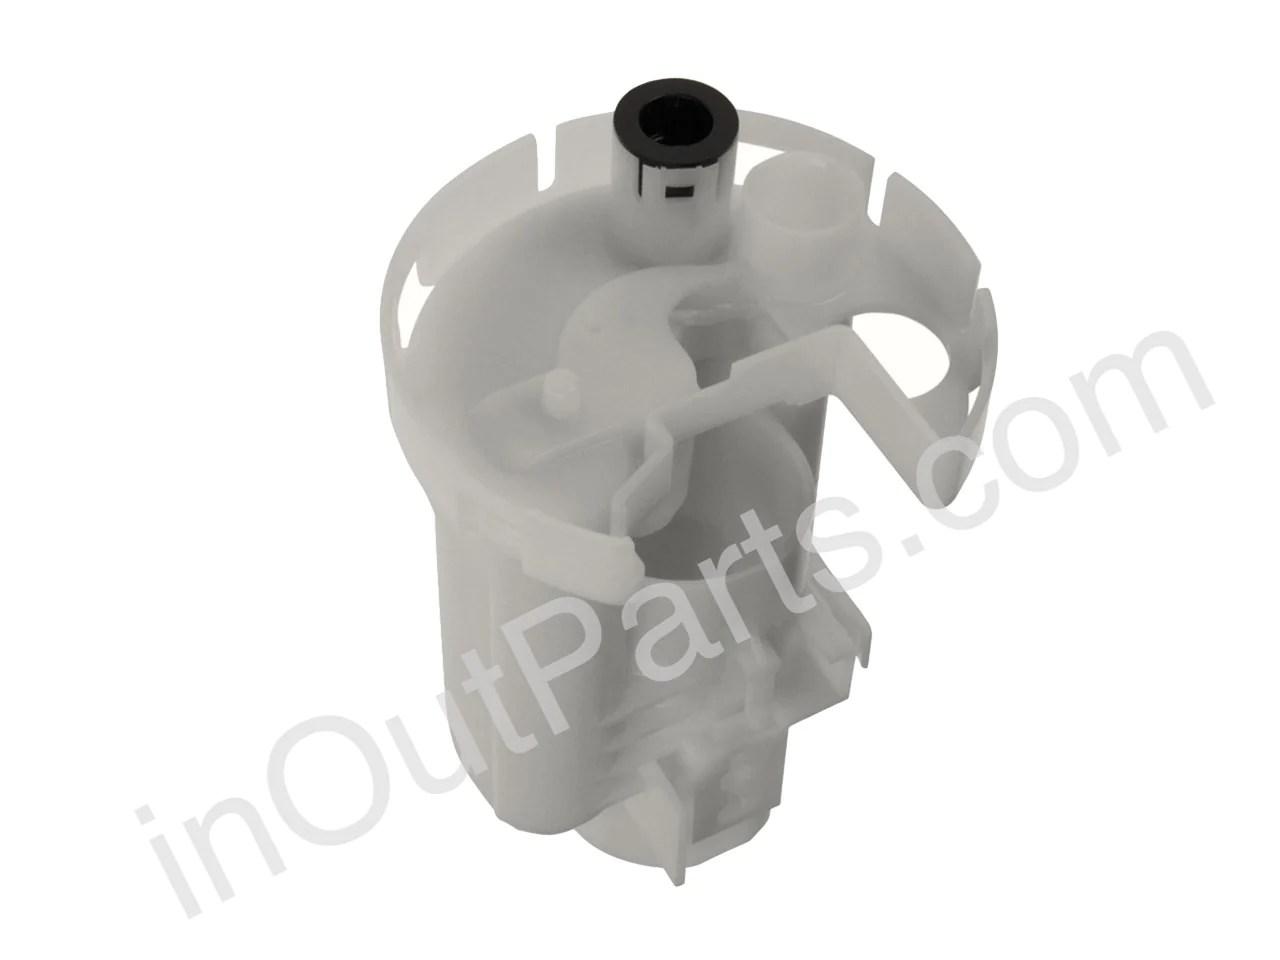 hight resolution of fuel filter fits toyota alphard corolla camry harrier hailanderfuel filter fits toyota